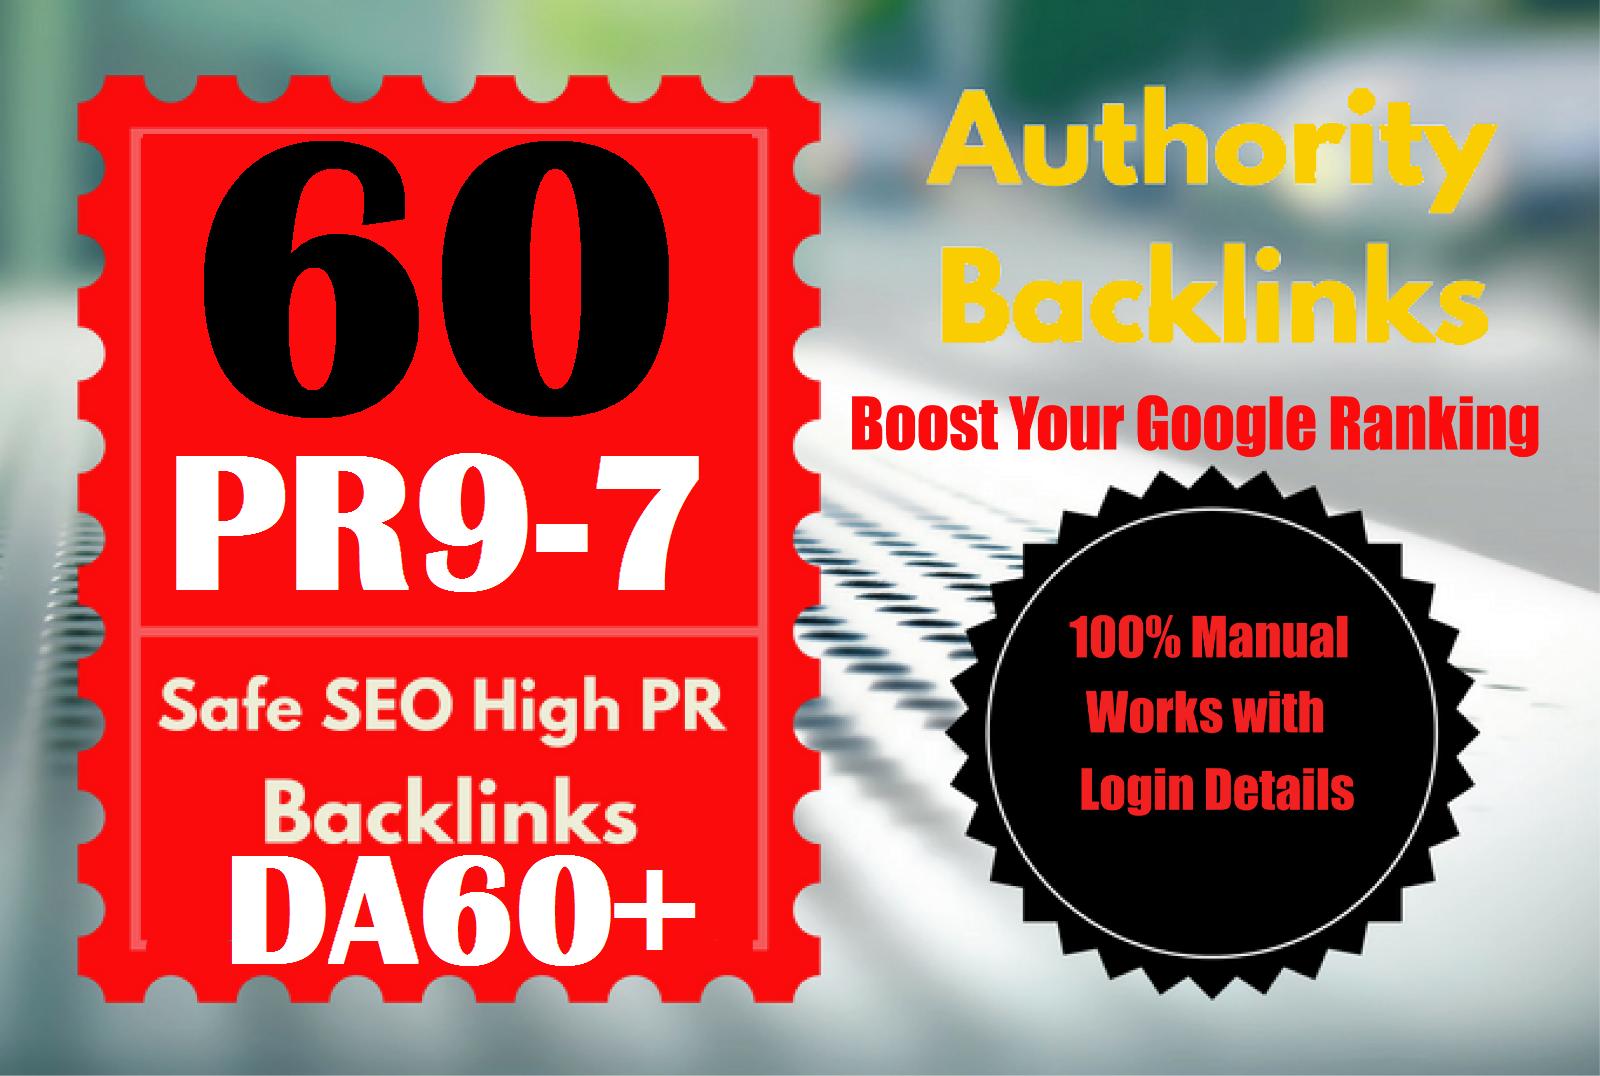 Manually Create TOP 60 DA60+ HQ Profile Backlinks to increase SERP SEO WEB Ranking